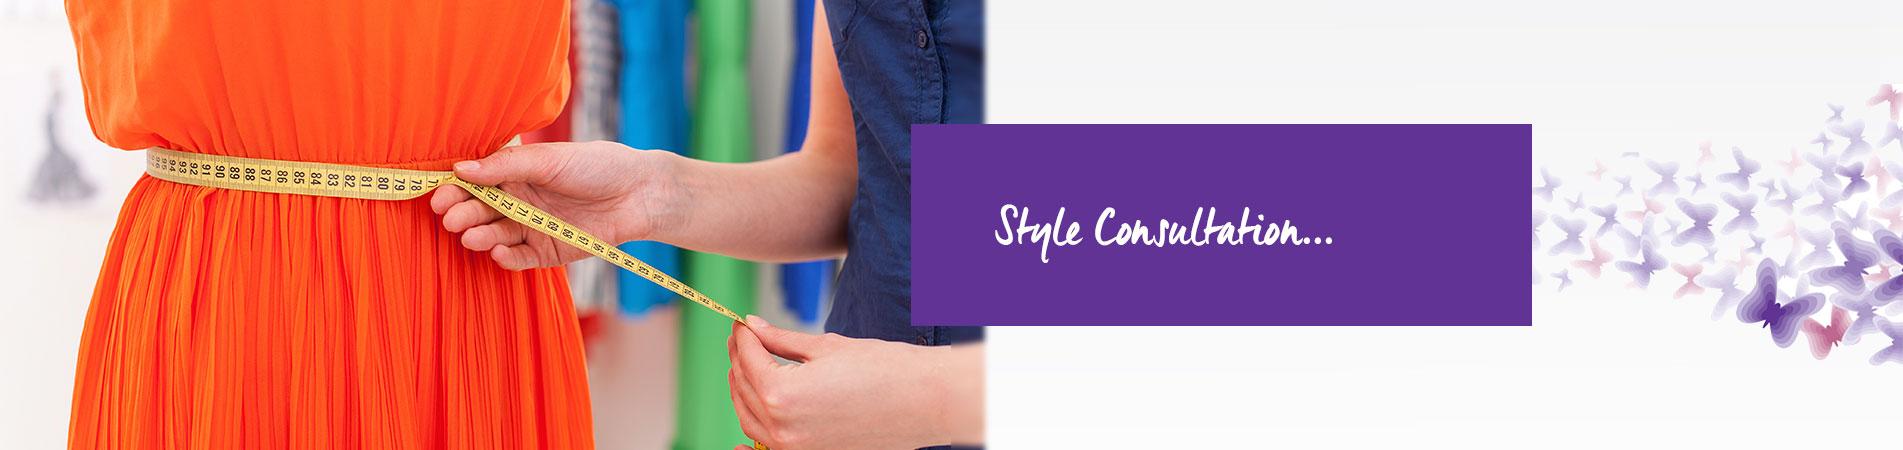 Personal Style Consultations - Sunshine Coast